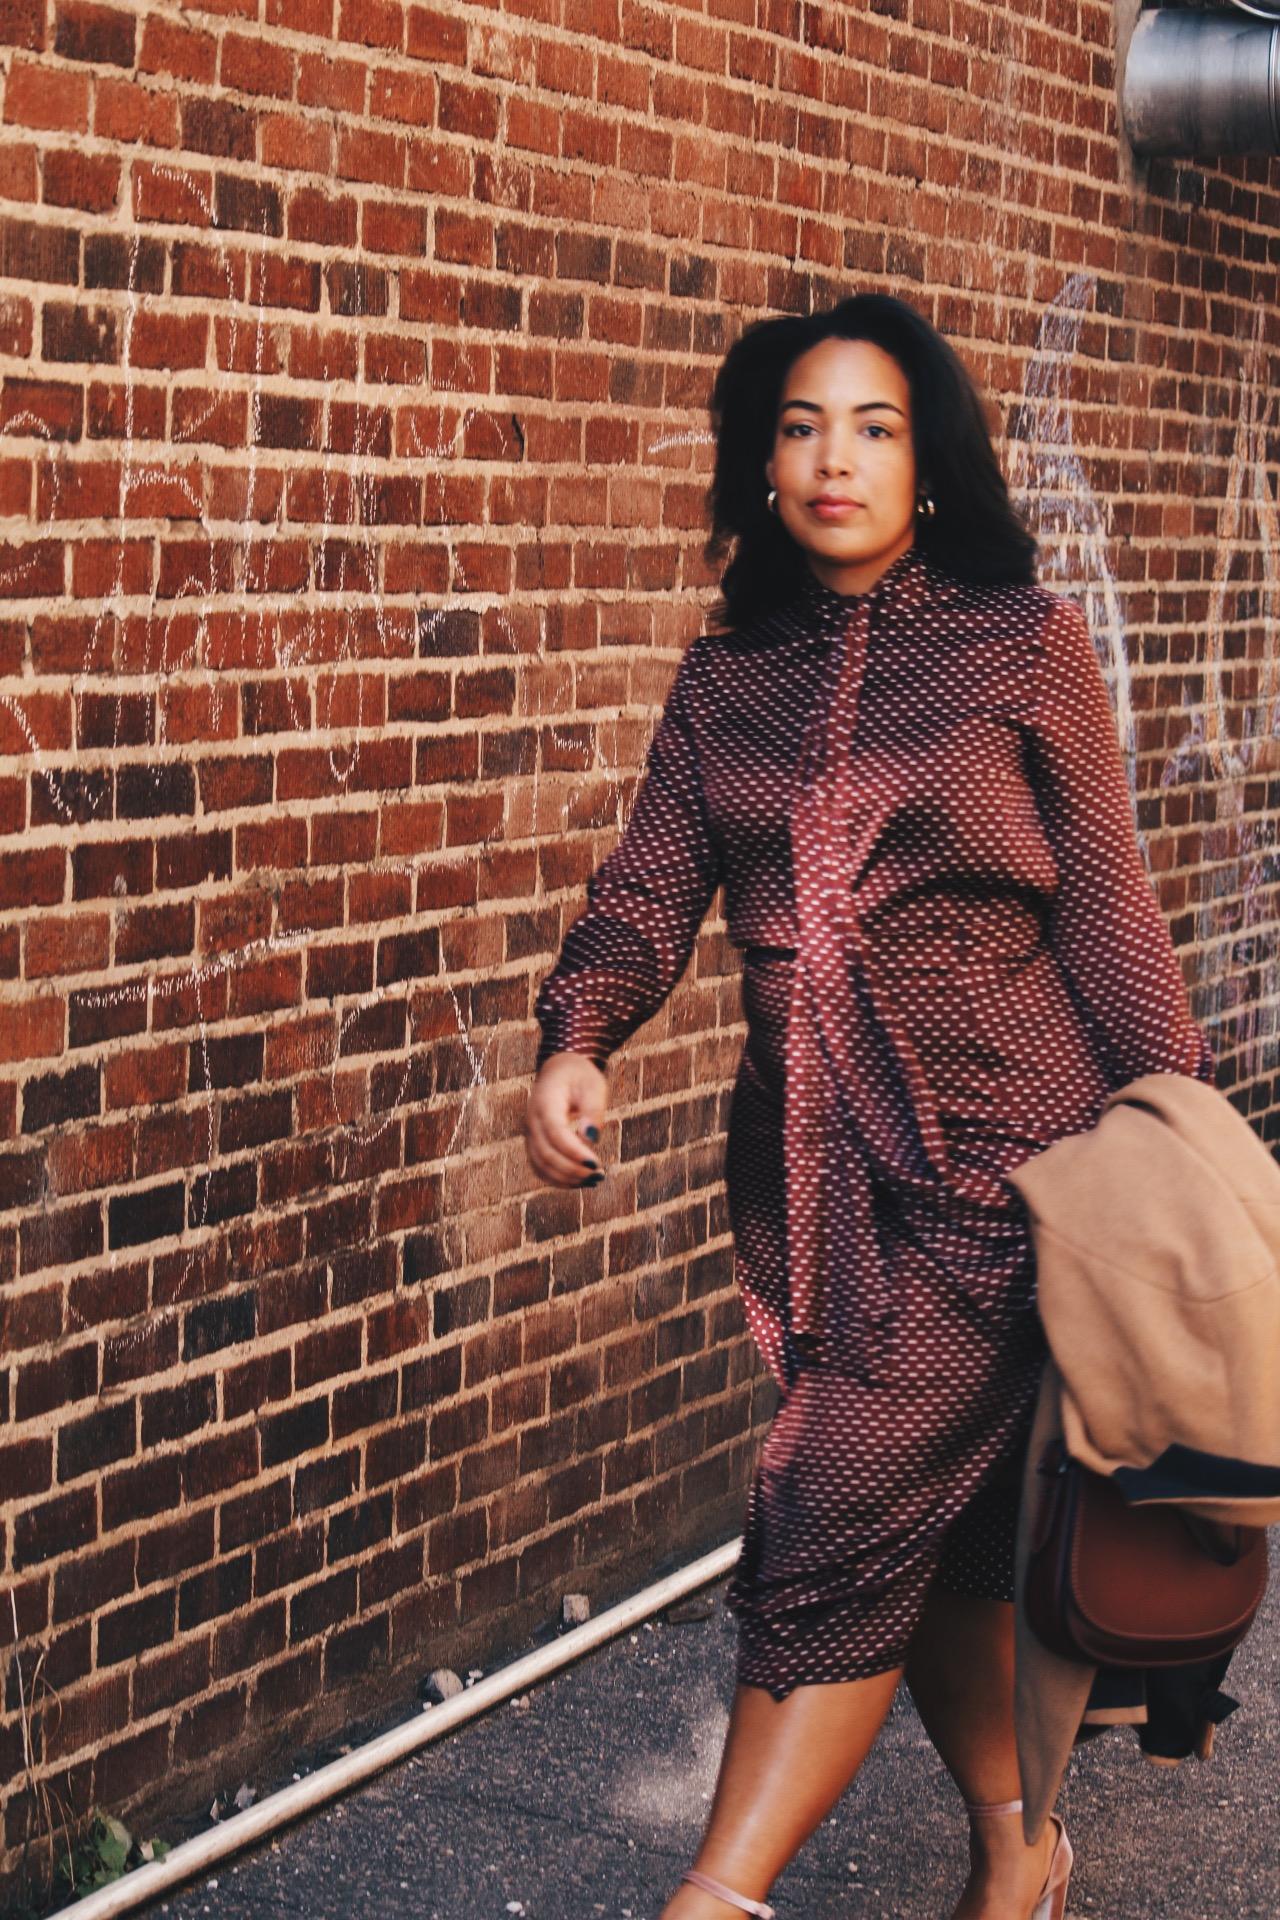 Zara-polka-dot-blouse-and-skirt-urban-outfitters-camel-coat-coach-saddle-bag-topshop-gracie-velvet-heels-similar-aquazurra-alix-pumps-womens-workwear-fashion-17.JPG